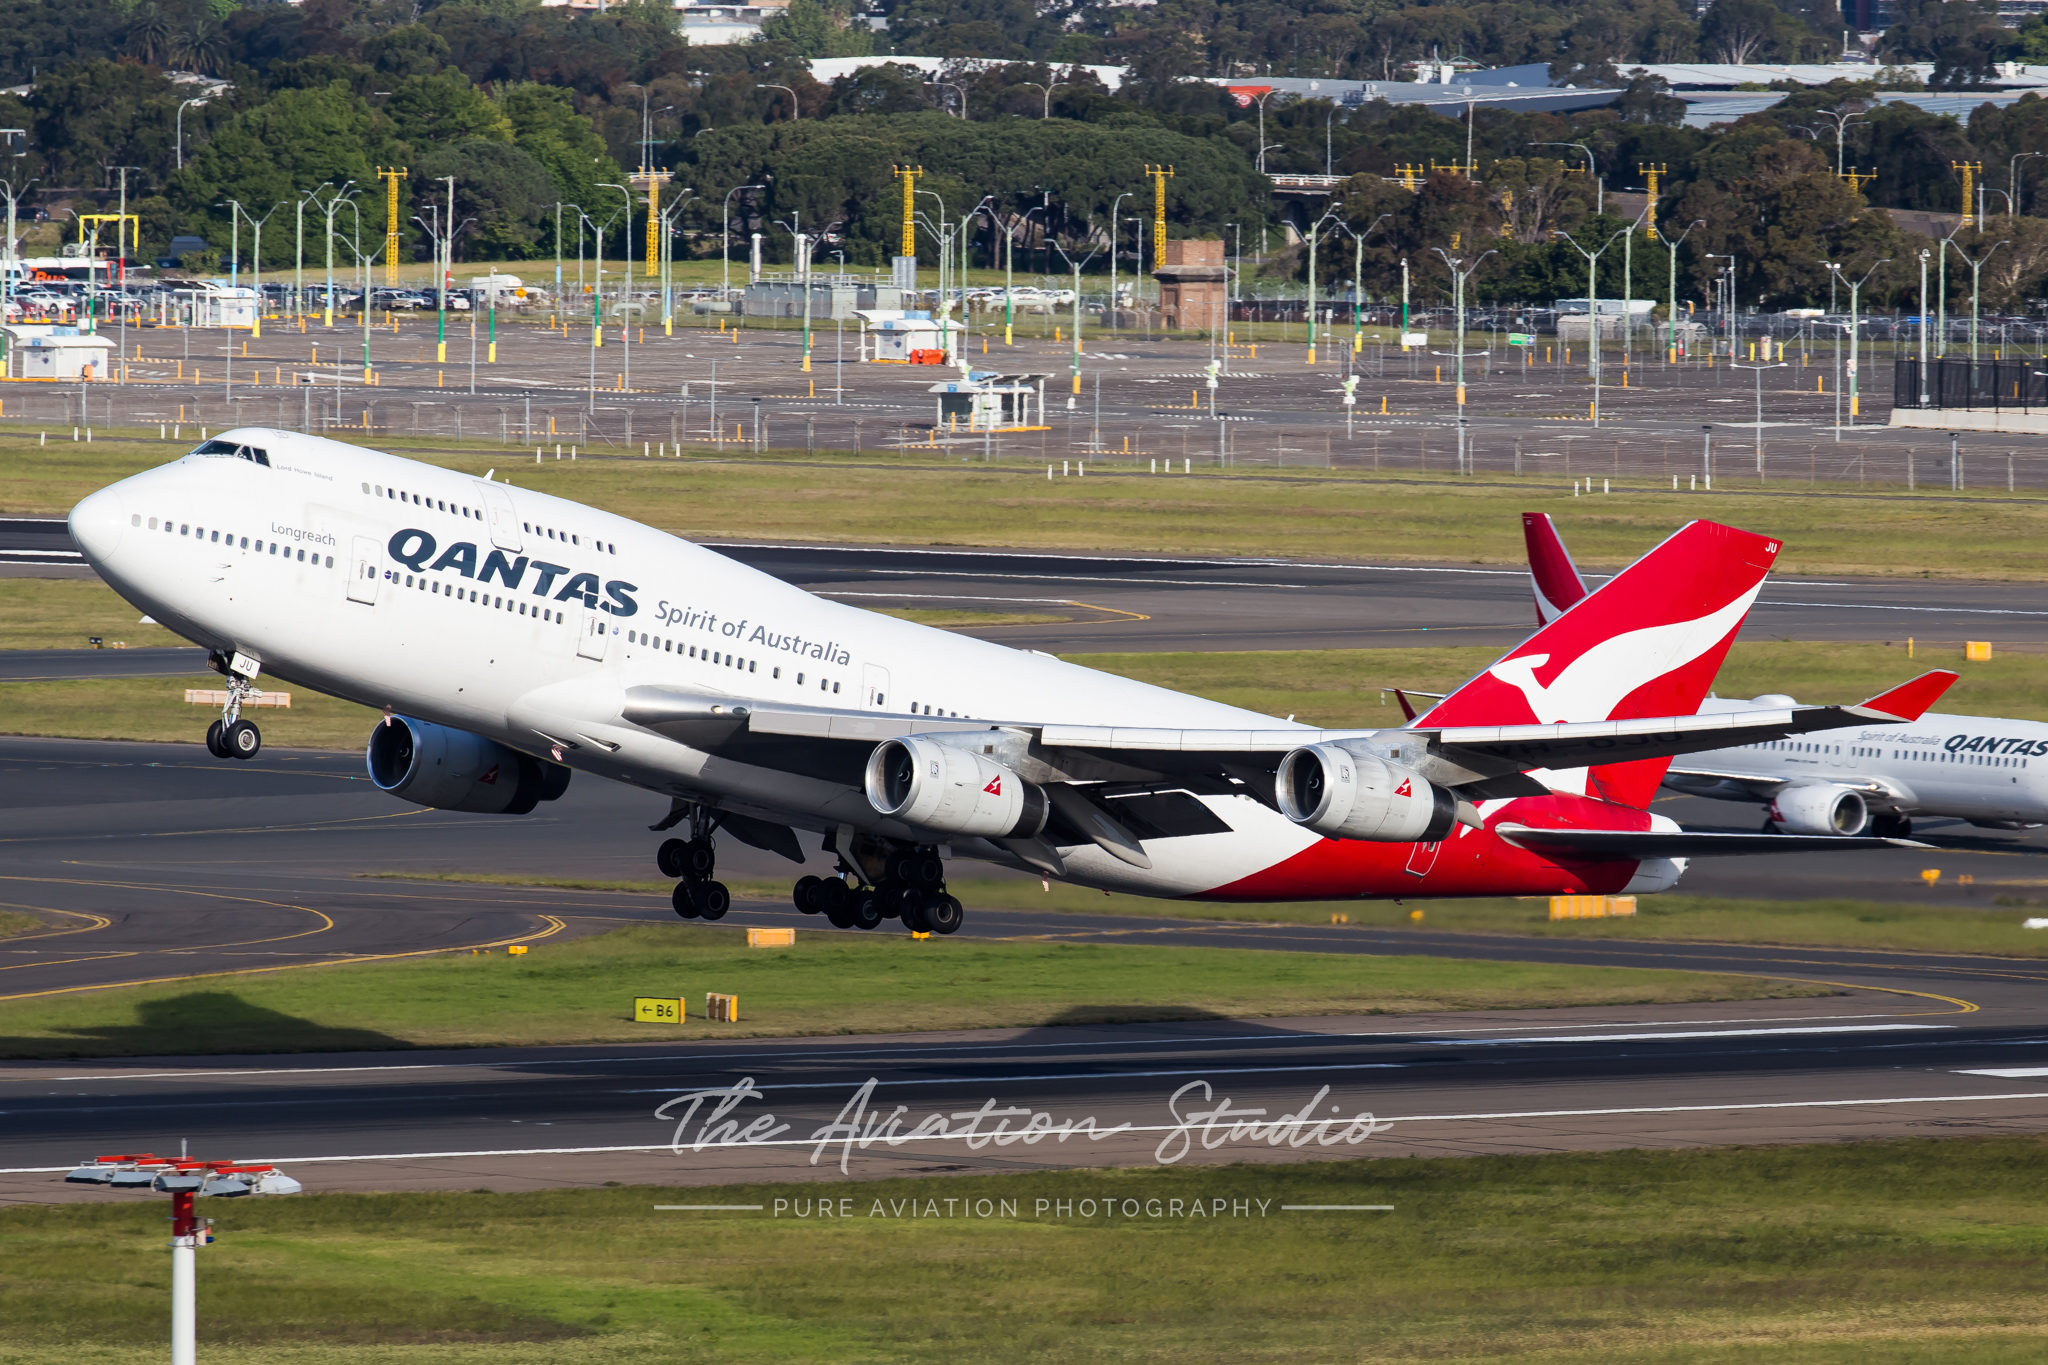 Qantas 747-400 VH-OJU departs Australia for the last time (Image: Rory Delaney)